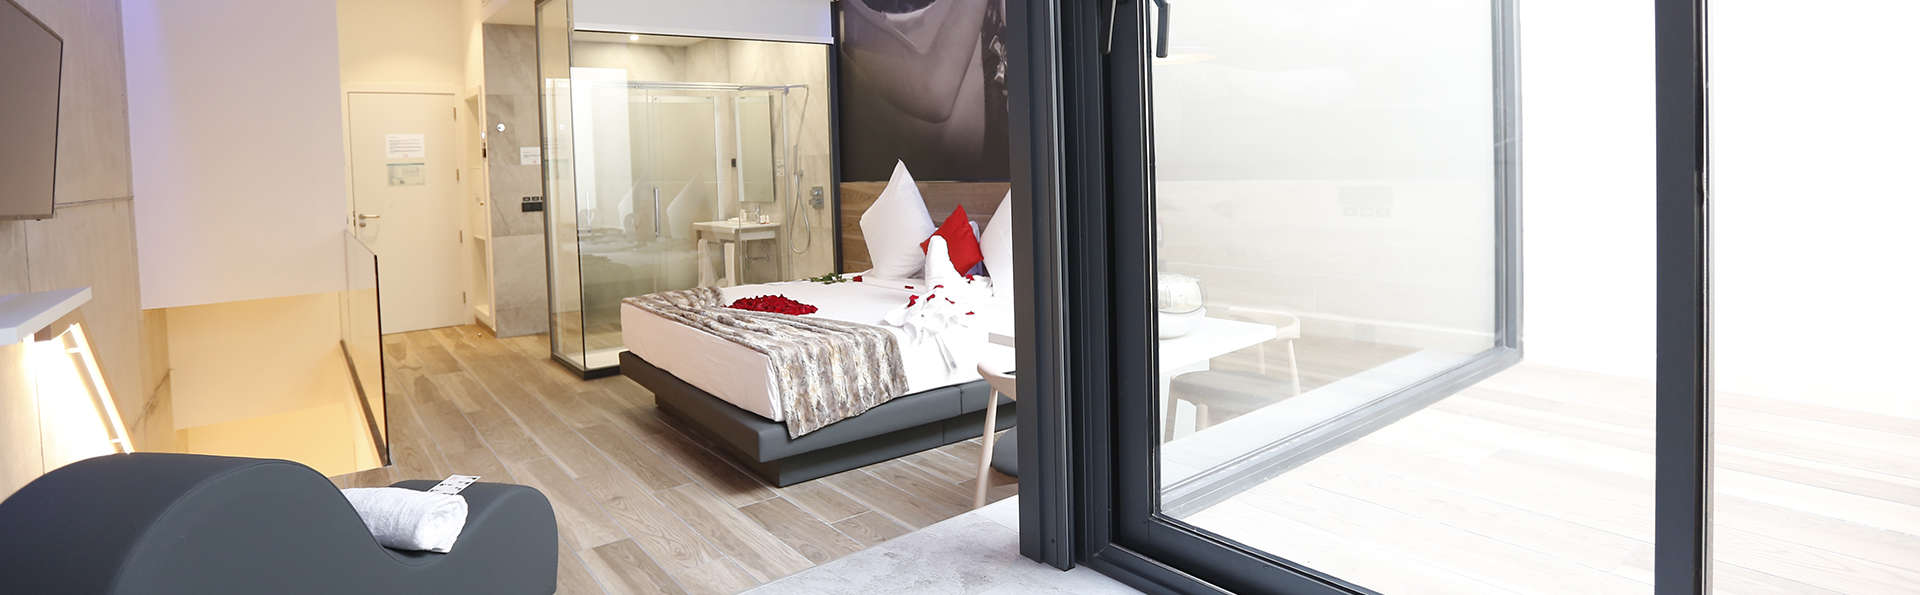 Hotel Loob Valencia (Adults Only) - EDIT_Master_habitacion_con_jacuzzi.jpg